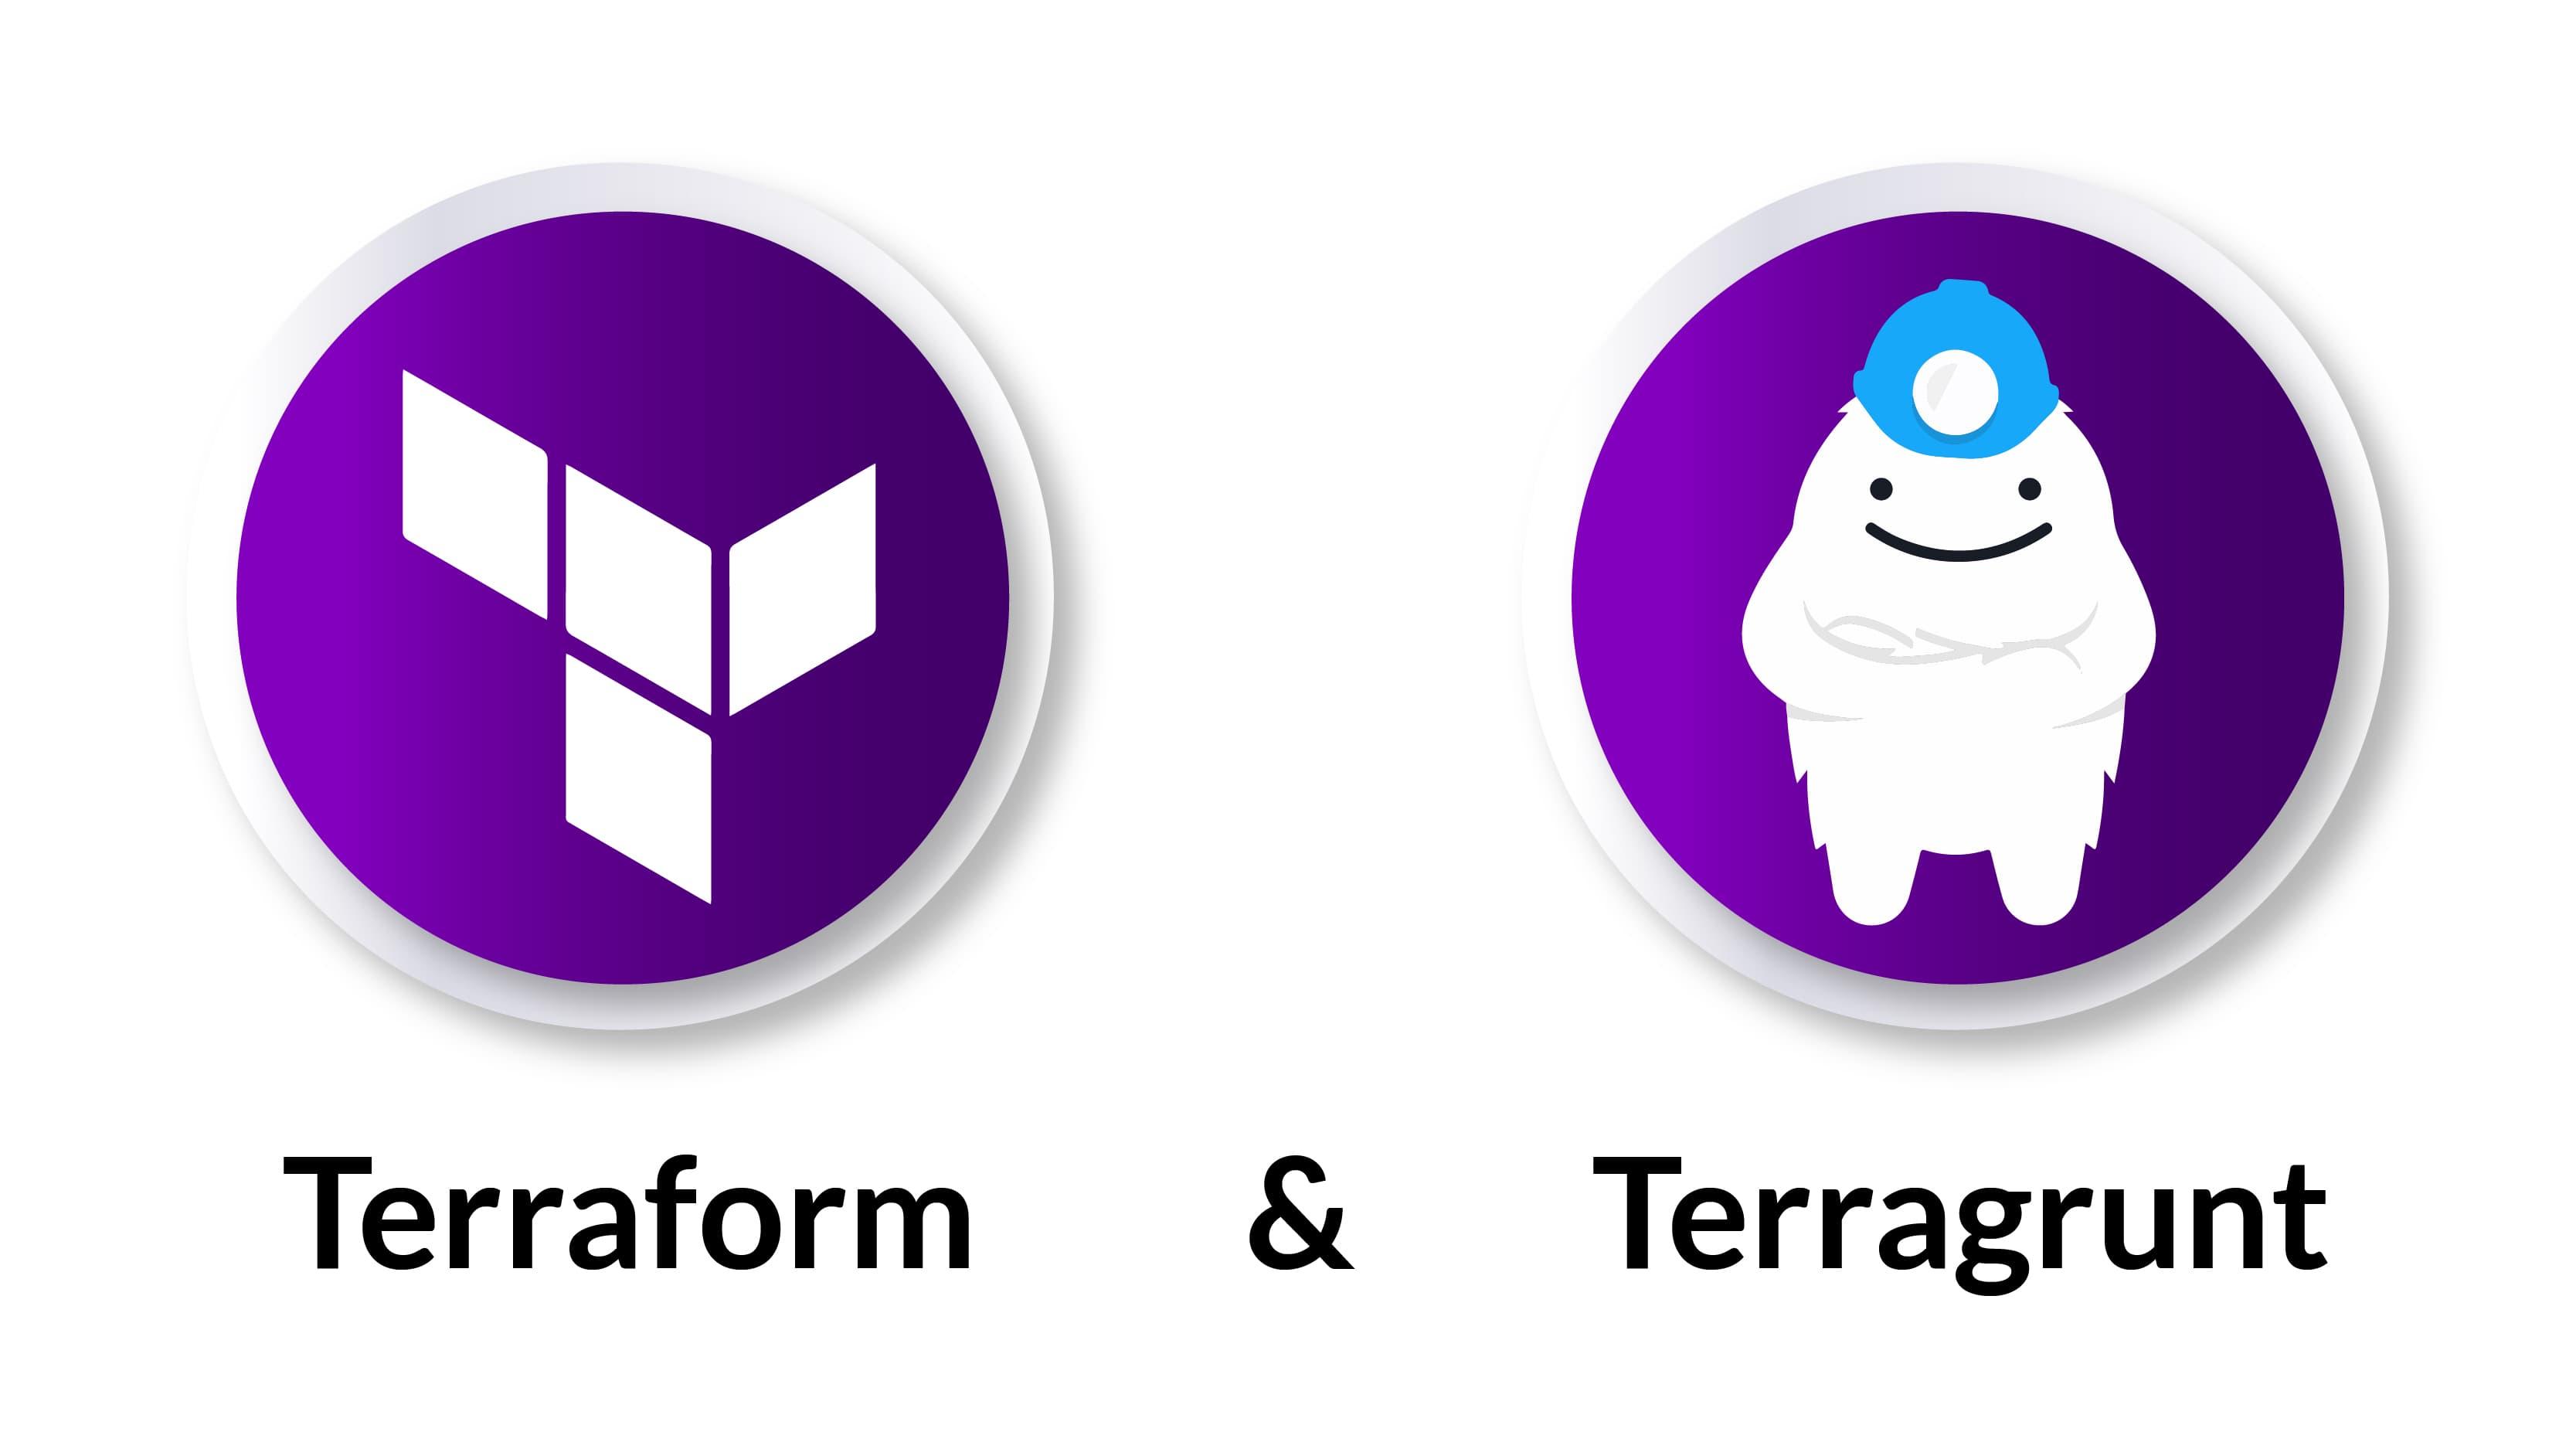 Terraform and Terragrunt logos